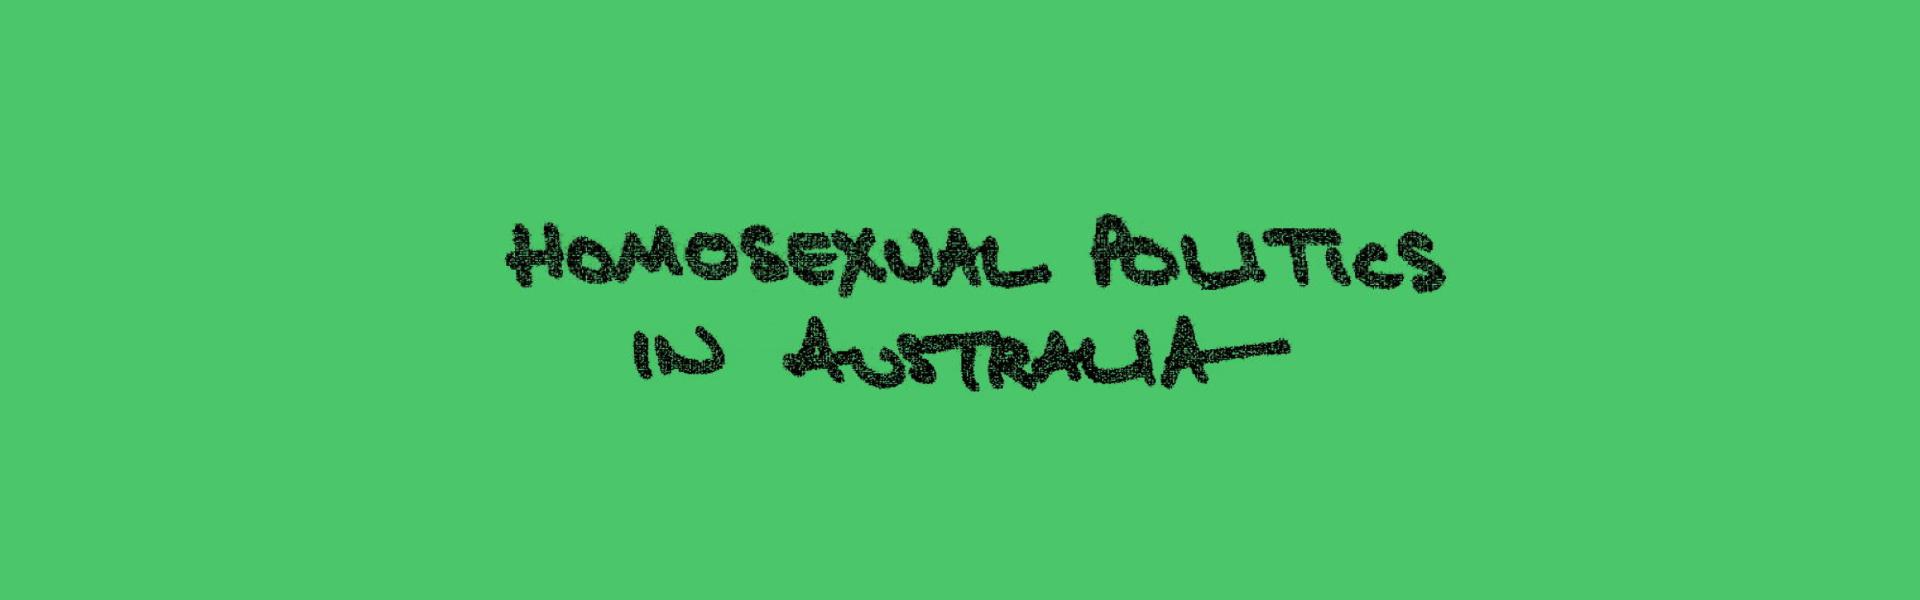 Homosexual Politics In Australia – Di Minnis, Craig Johnstone, 1978 – Banner Web